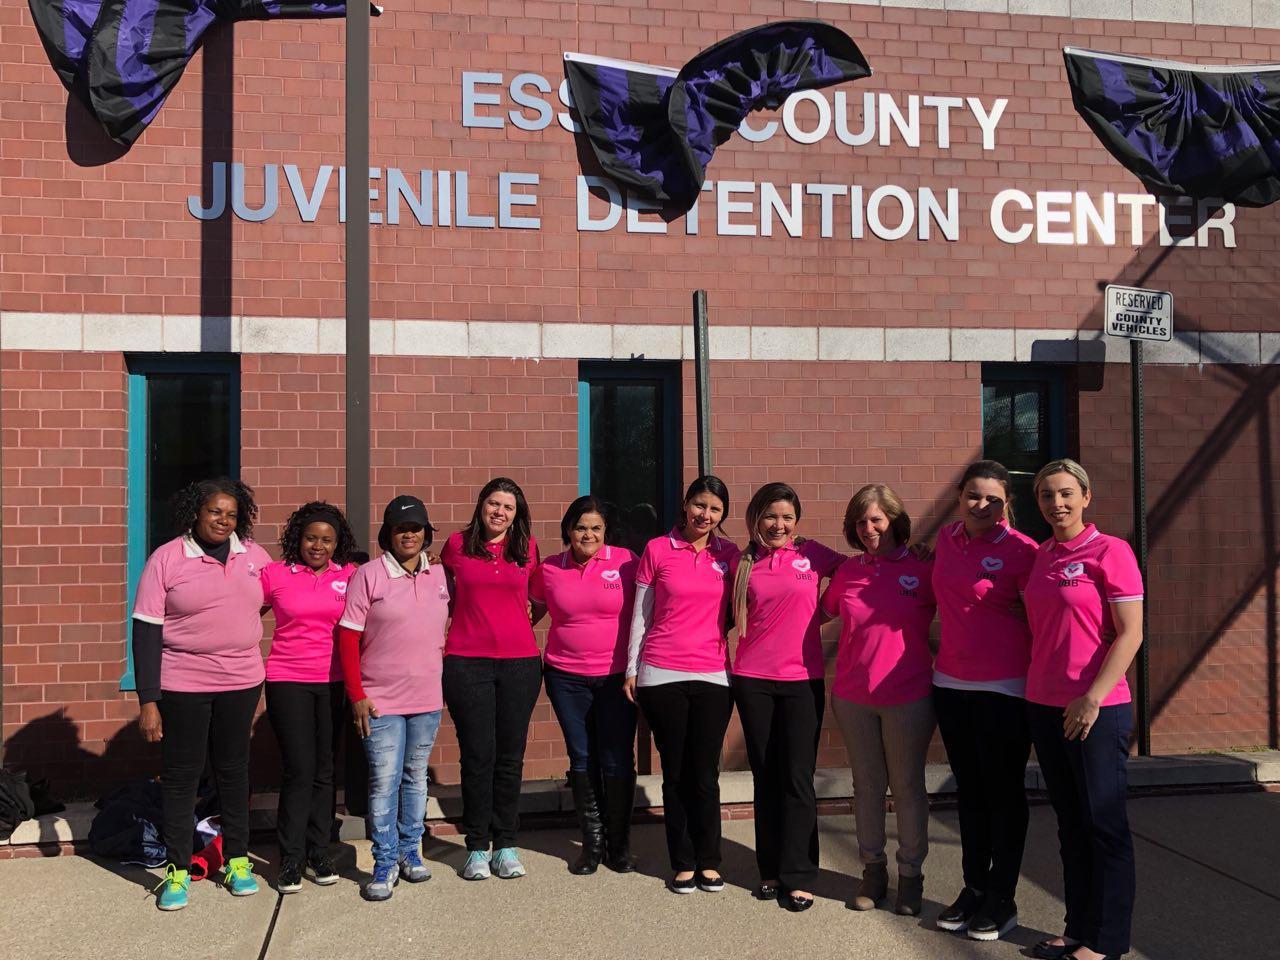 Essex County Juvenile Detention Center1 min read